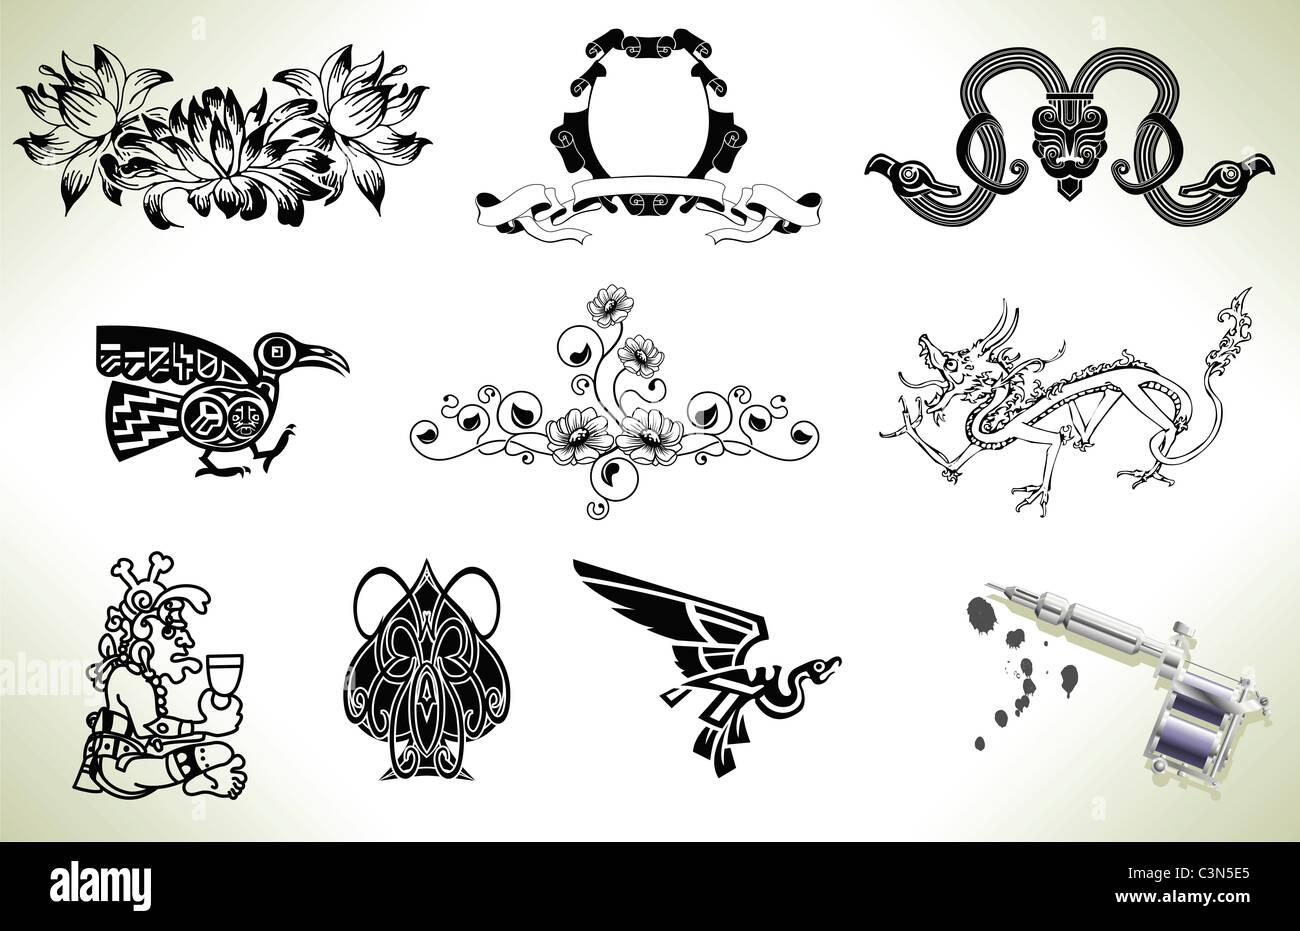 Series Set Of Tattoo Flash Design Elements With Tattooists Gun Or